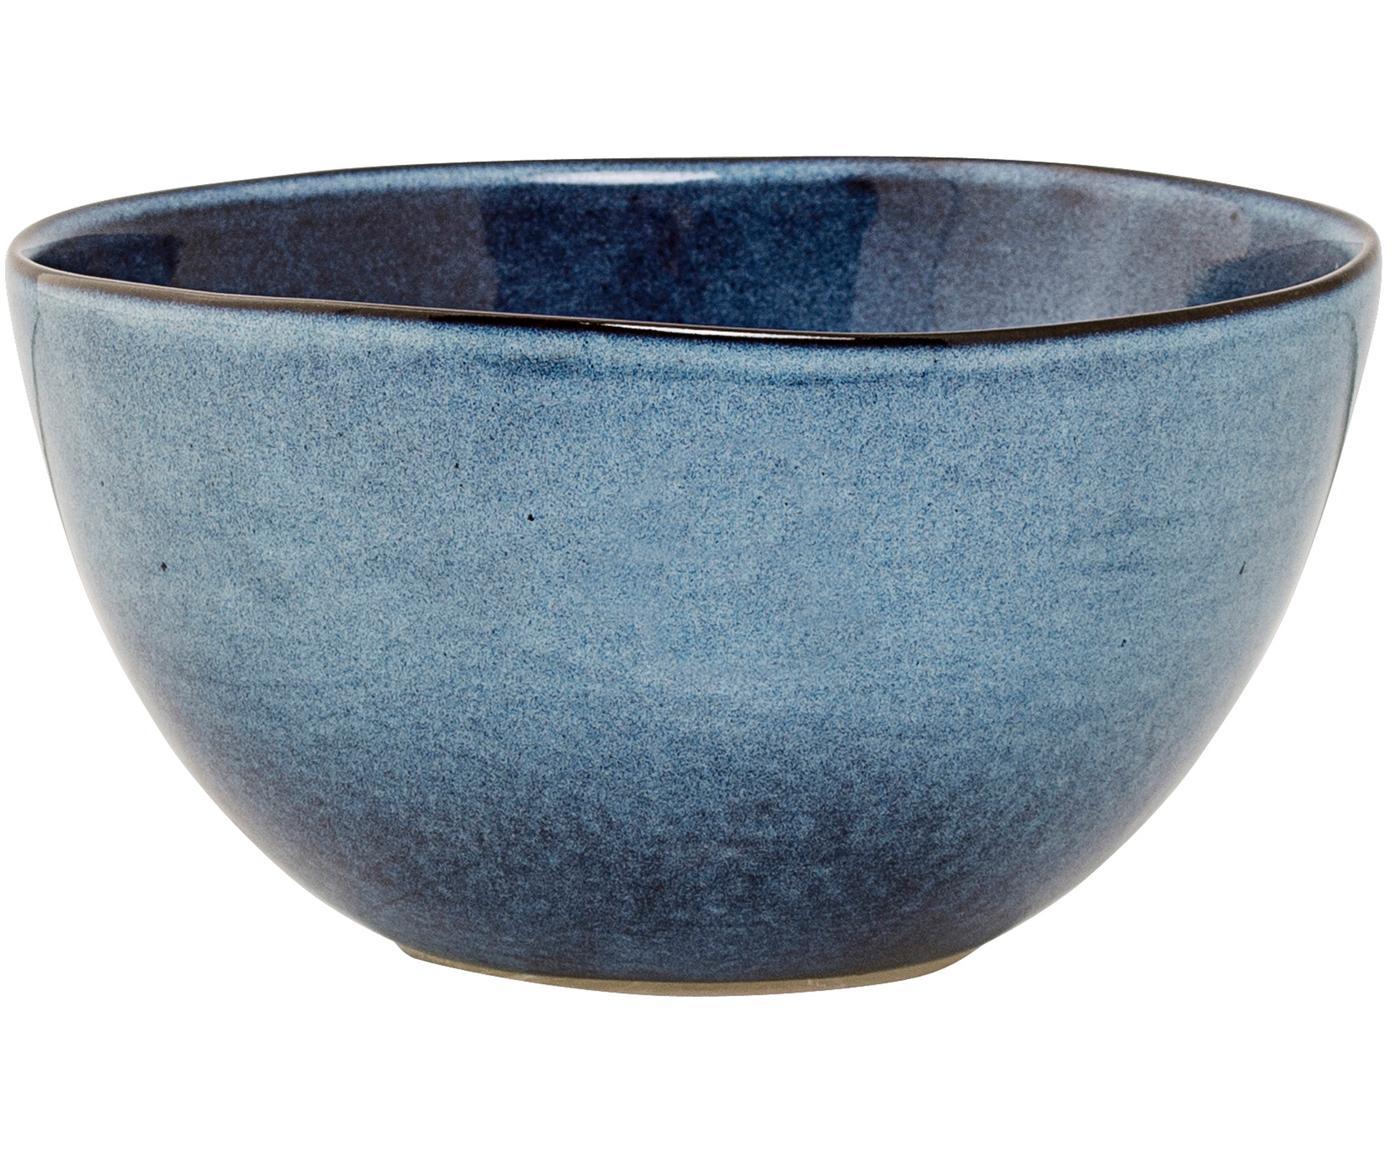 Boles artesanales Sandrine, 6uds., Cerámica, Azul, Ø 15 x Al 8 cm